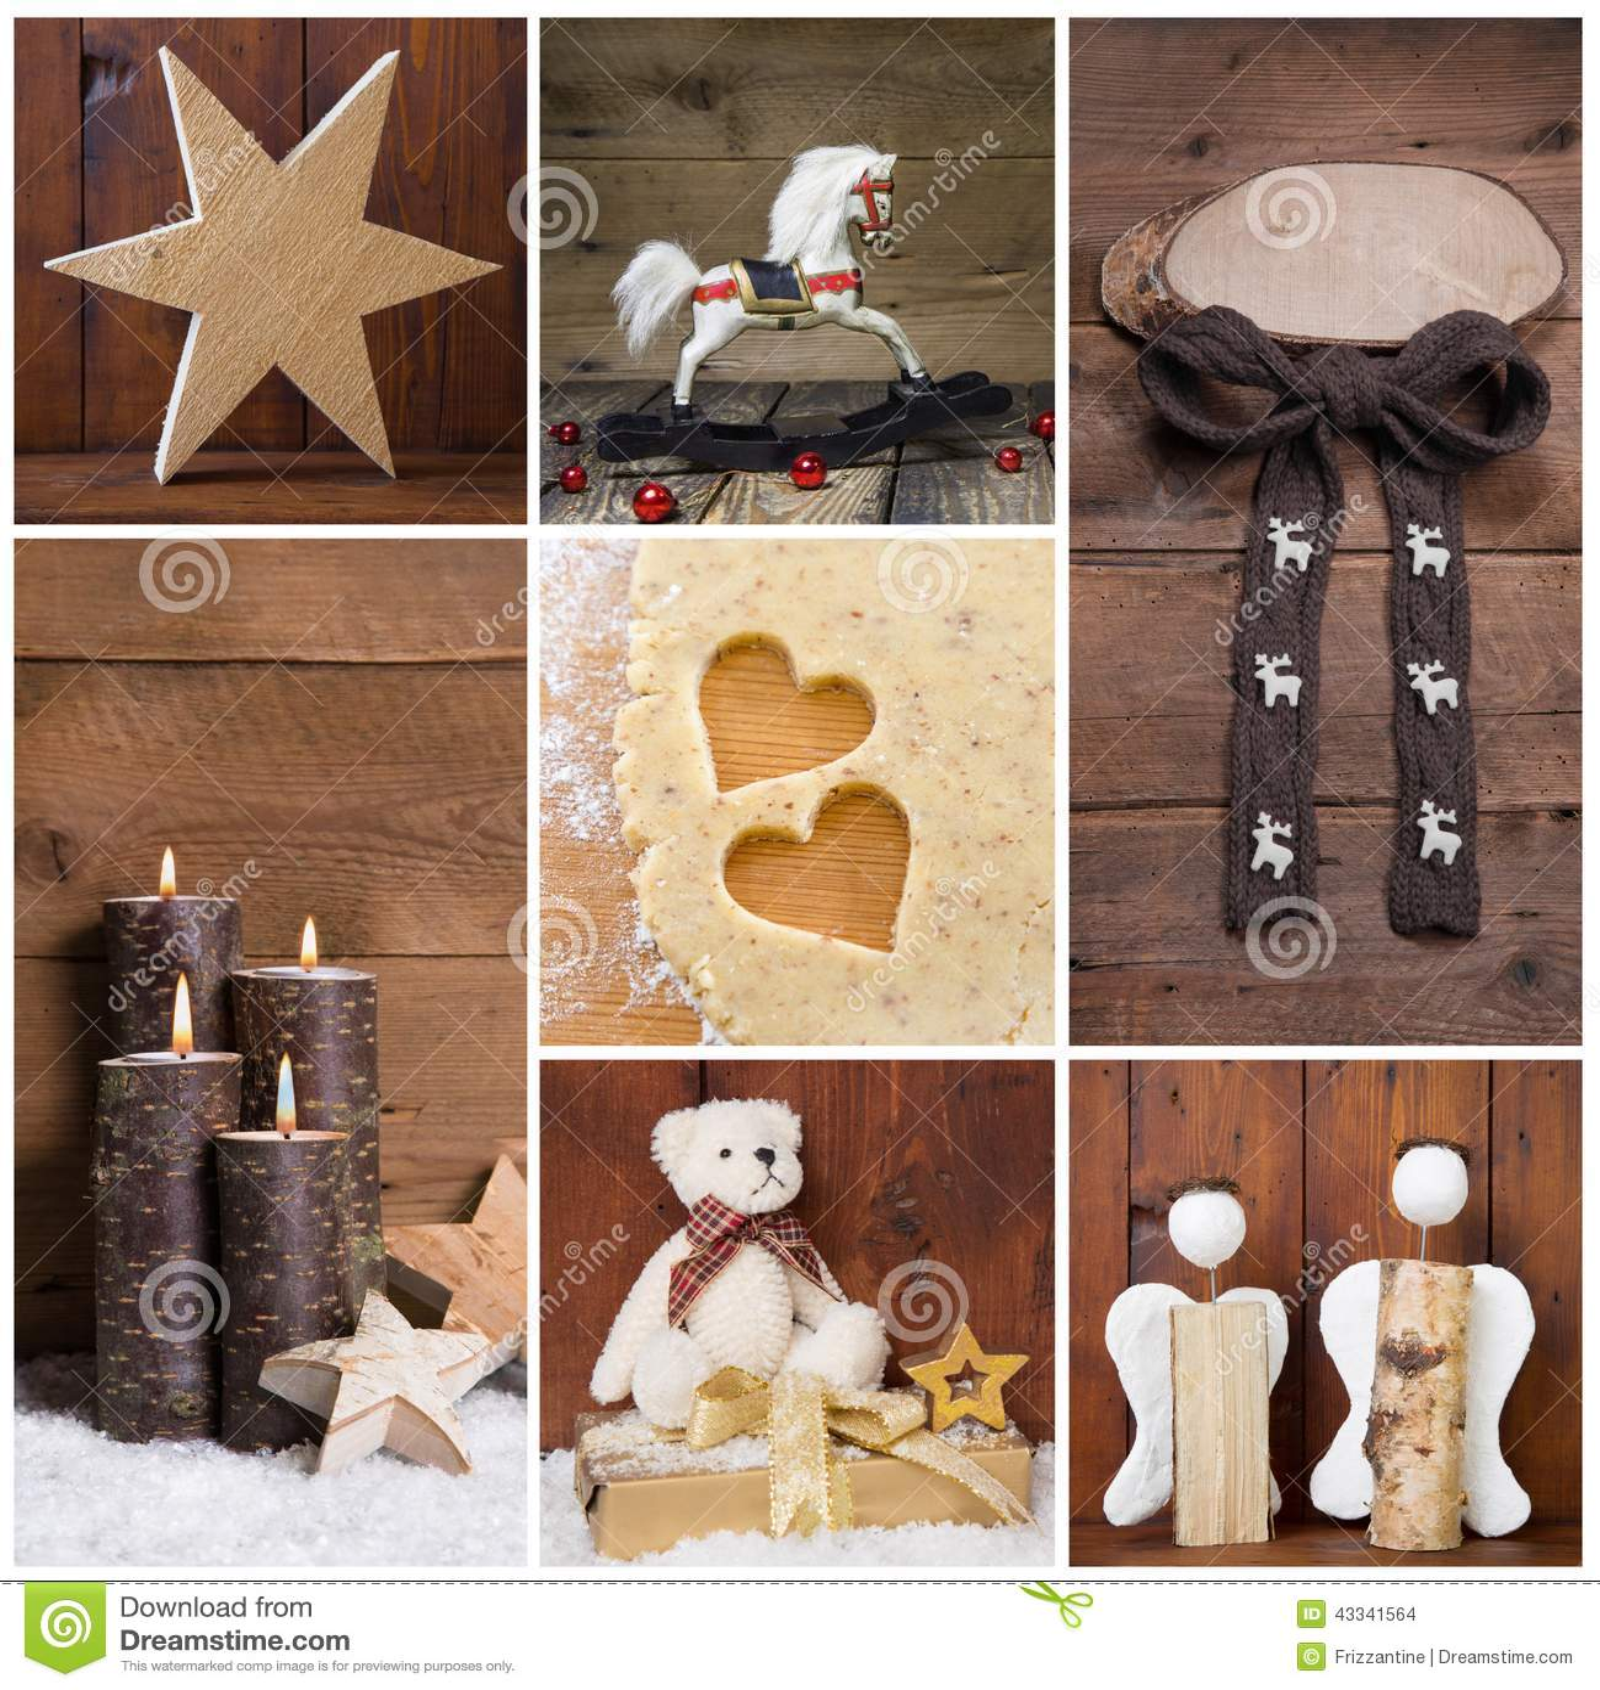 Decoraci n natural de la navidad con madera diversos for Objetos de decoracion